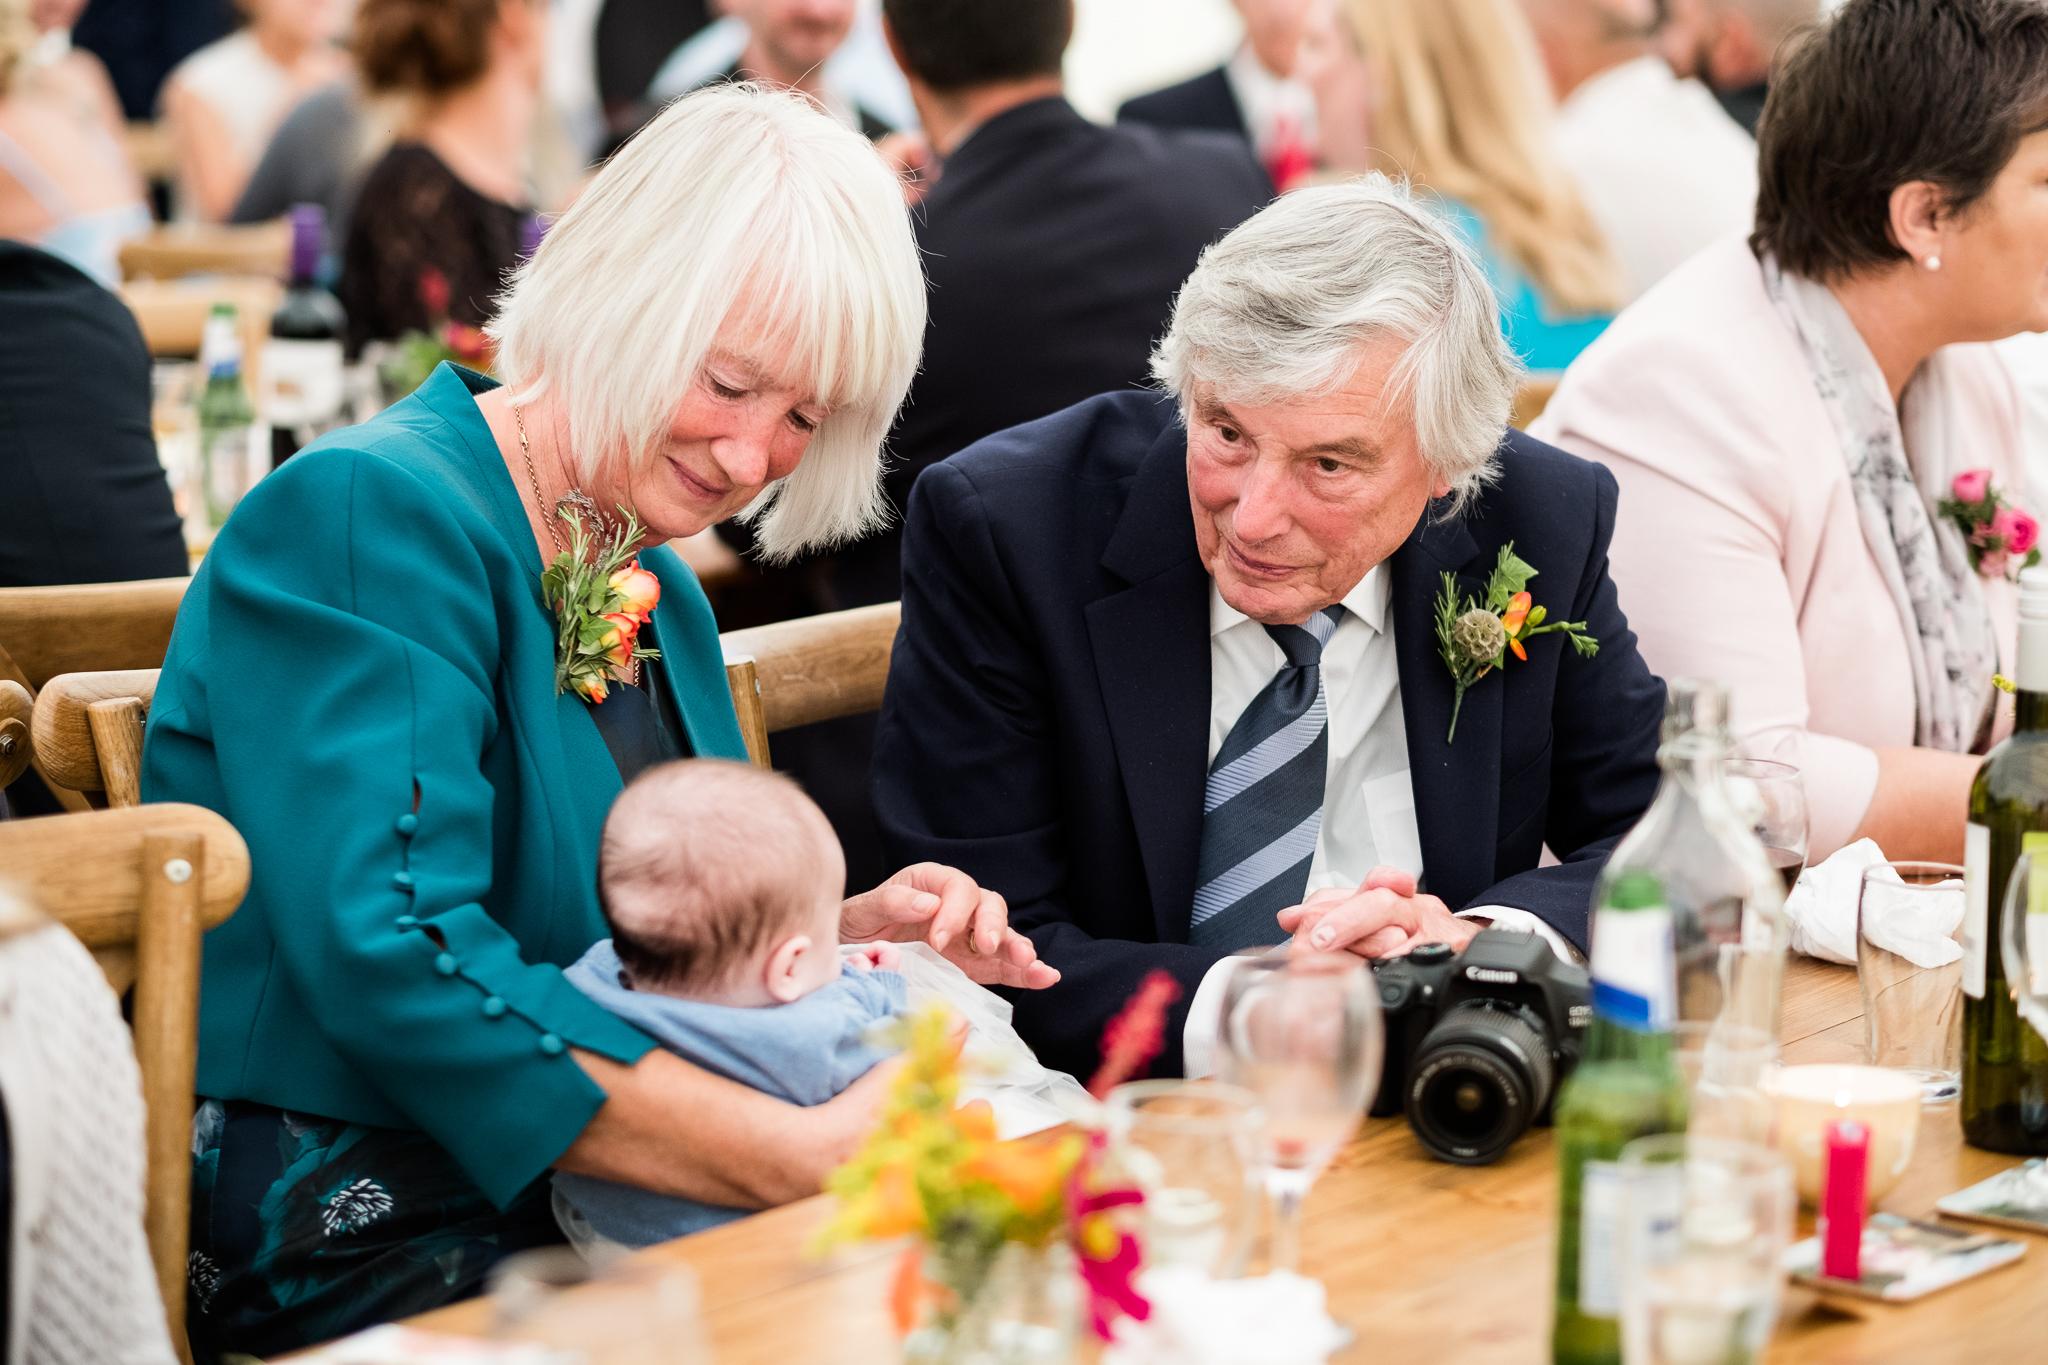 Relaxed Documentary Wedding Photography at The Wizard Inn, Alderley Edge Cheshire - Jenny Harper-58.jpg